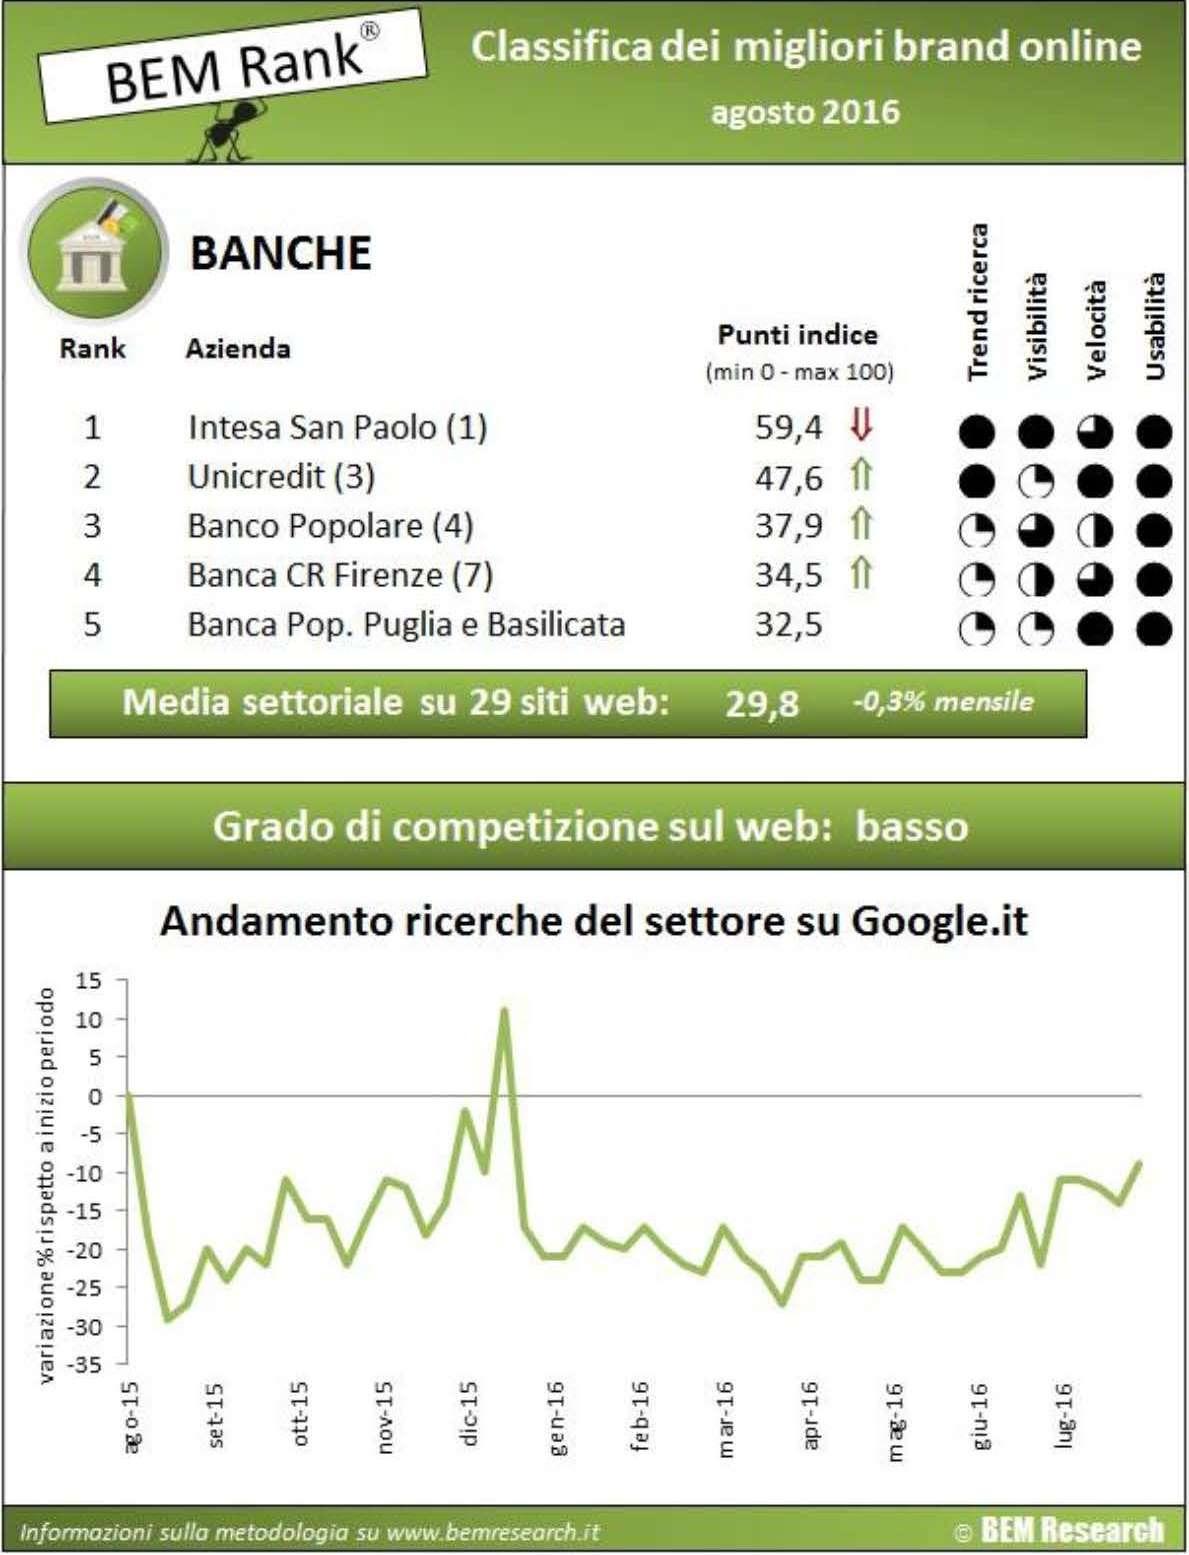 Banche Customer Experience Online Vince Intesa Sanpaolo Corcom